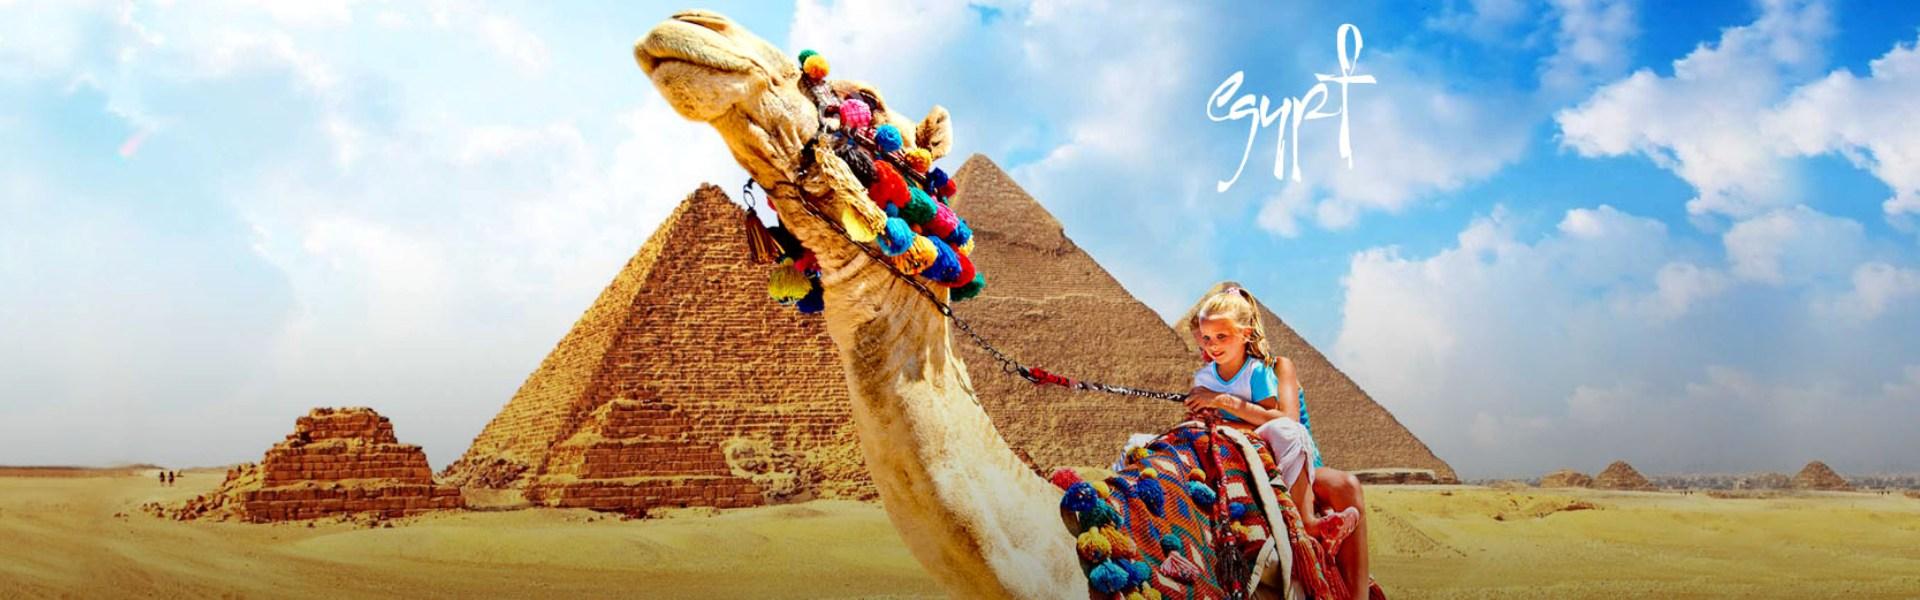 EGIPET3